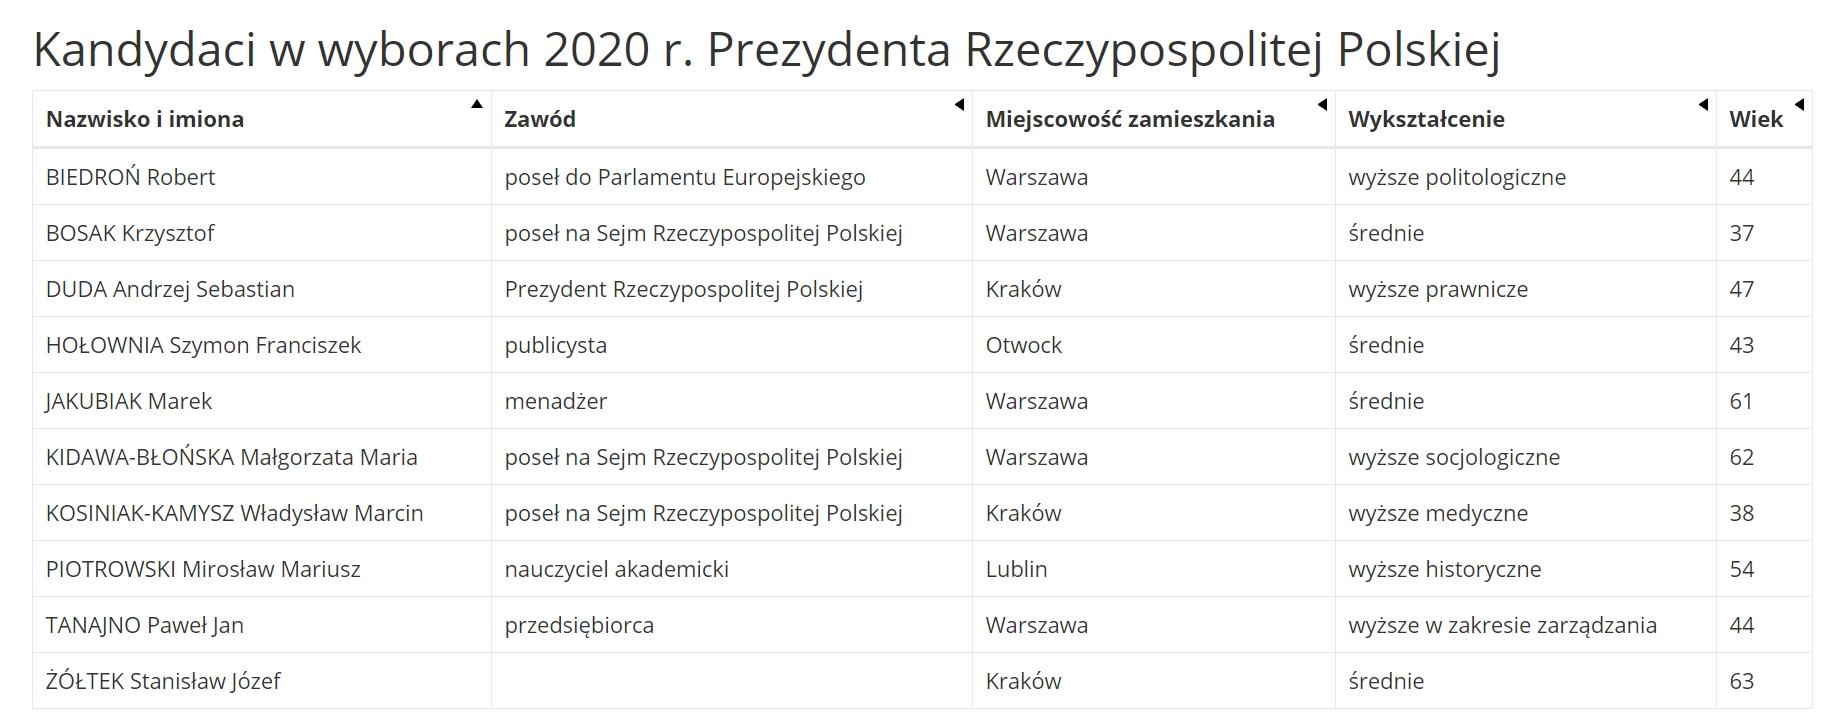 Debata prezydencka 6 maja 2020 r. - kandydaci do fotelu prezydenta (mat. PKW)